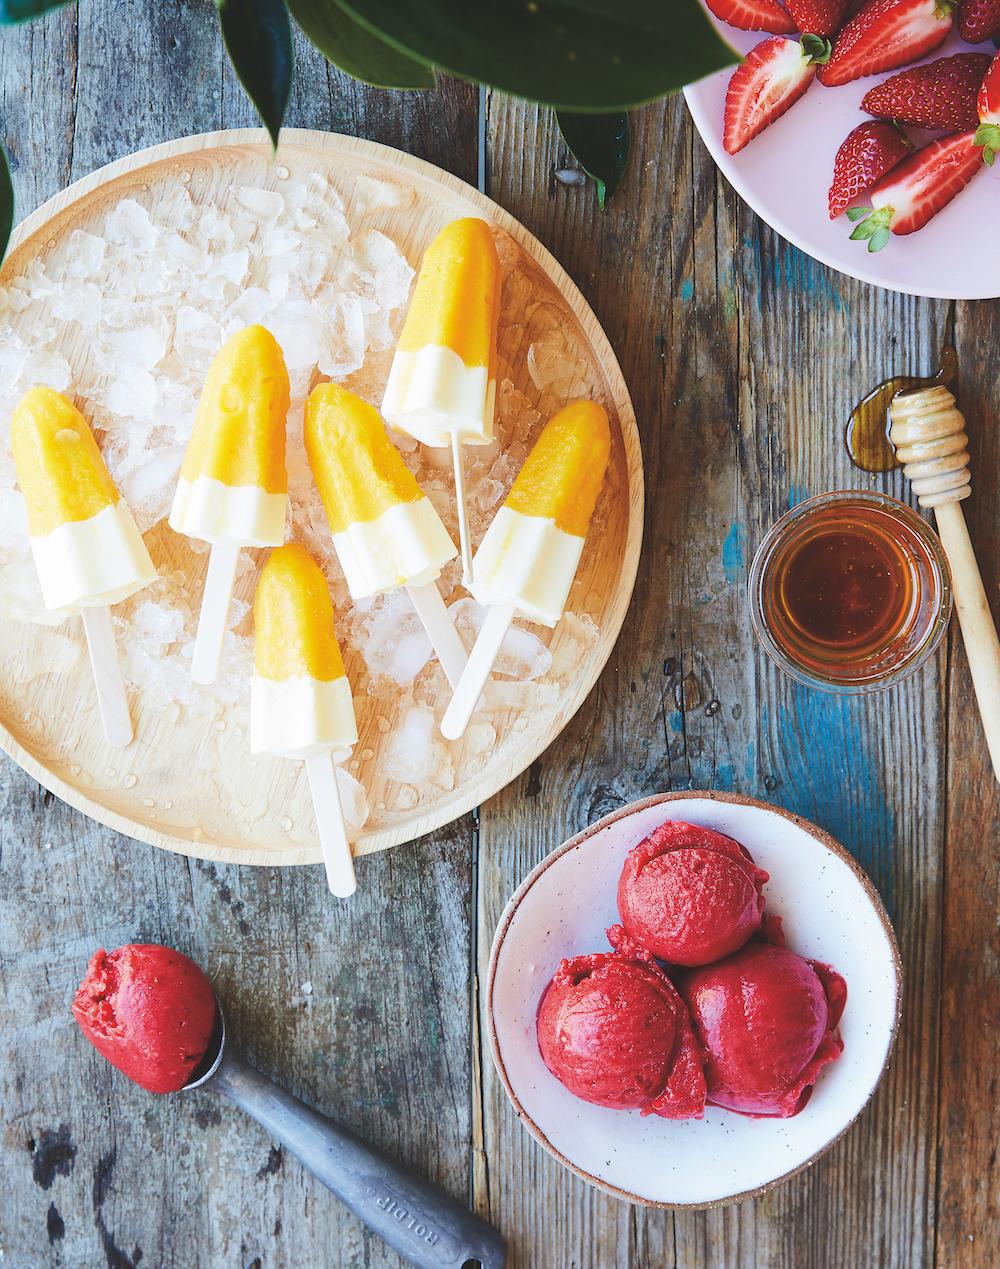 Mango Ice-Cream Bars image 2 SML.jpg